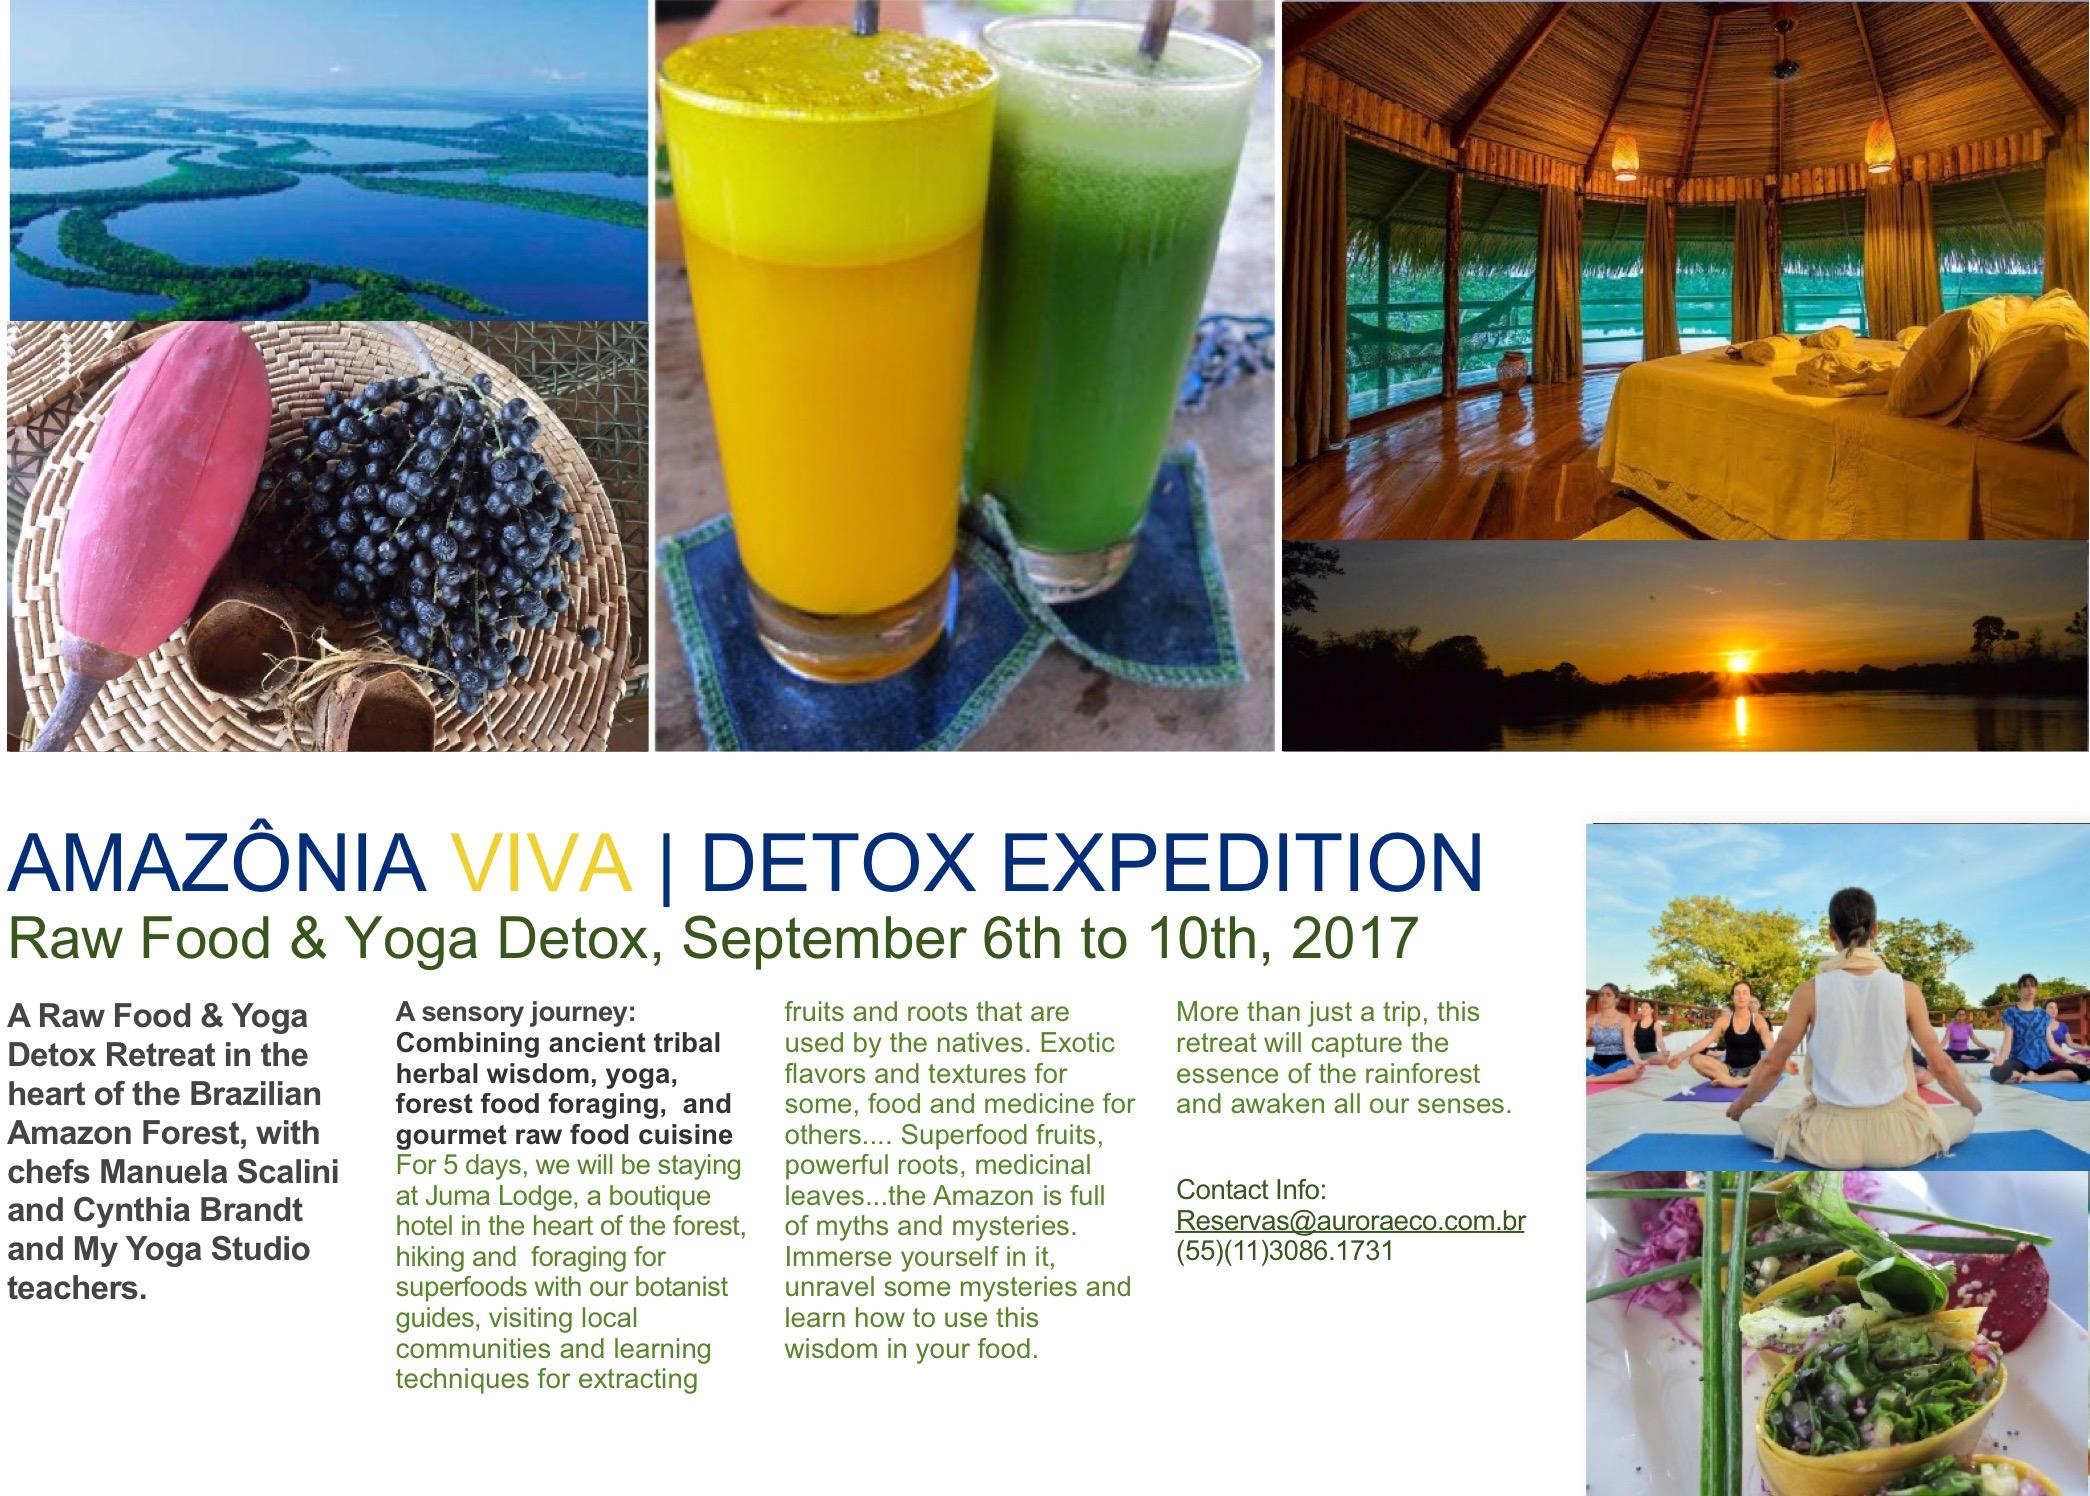 amazon raw food detox retreat : Manuela Scalini